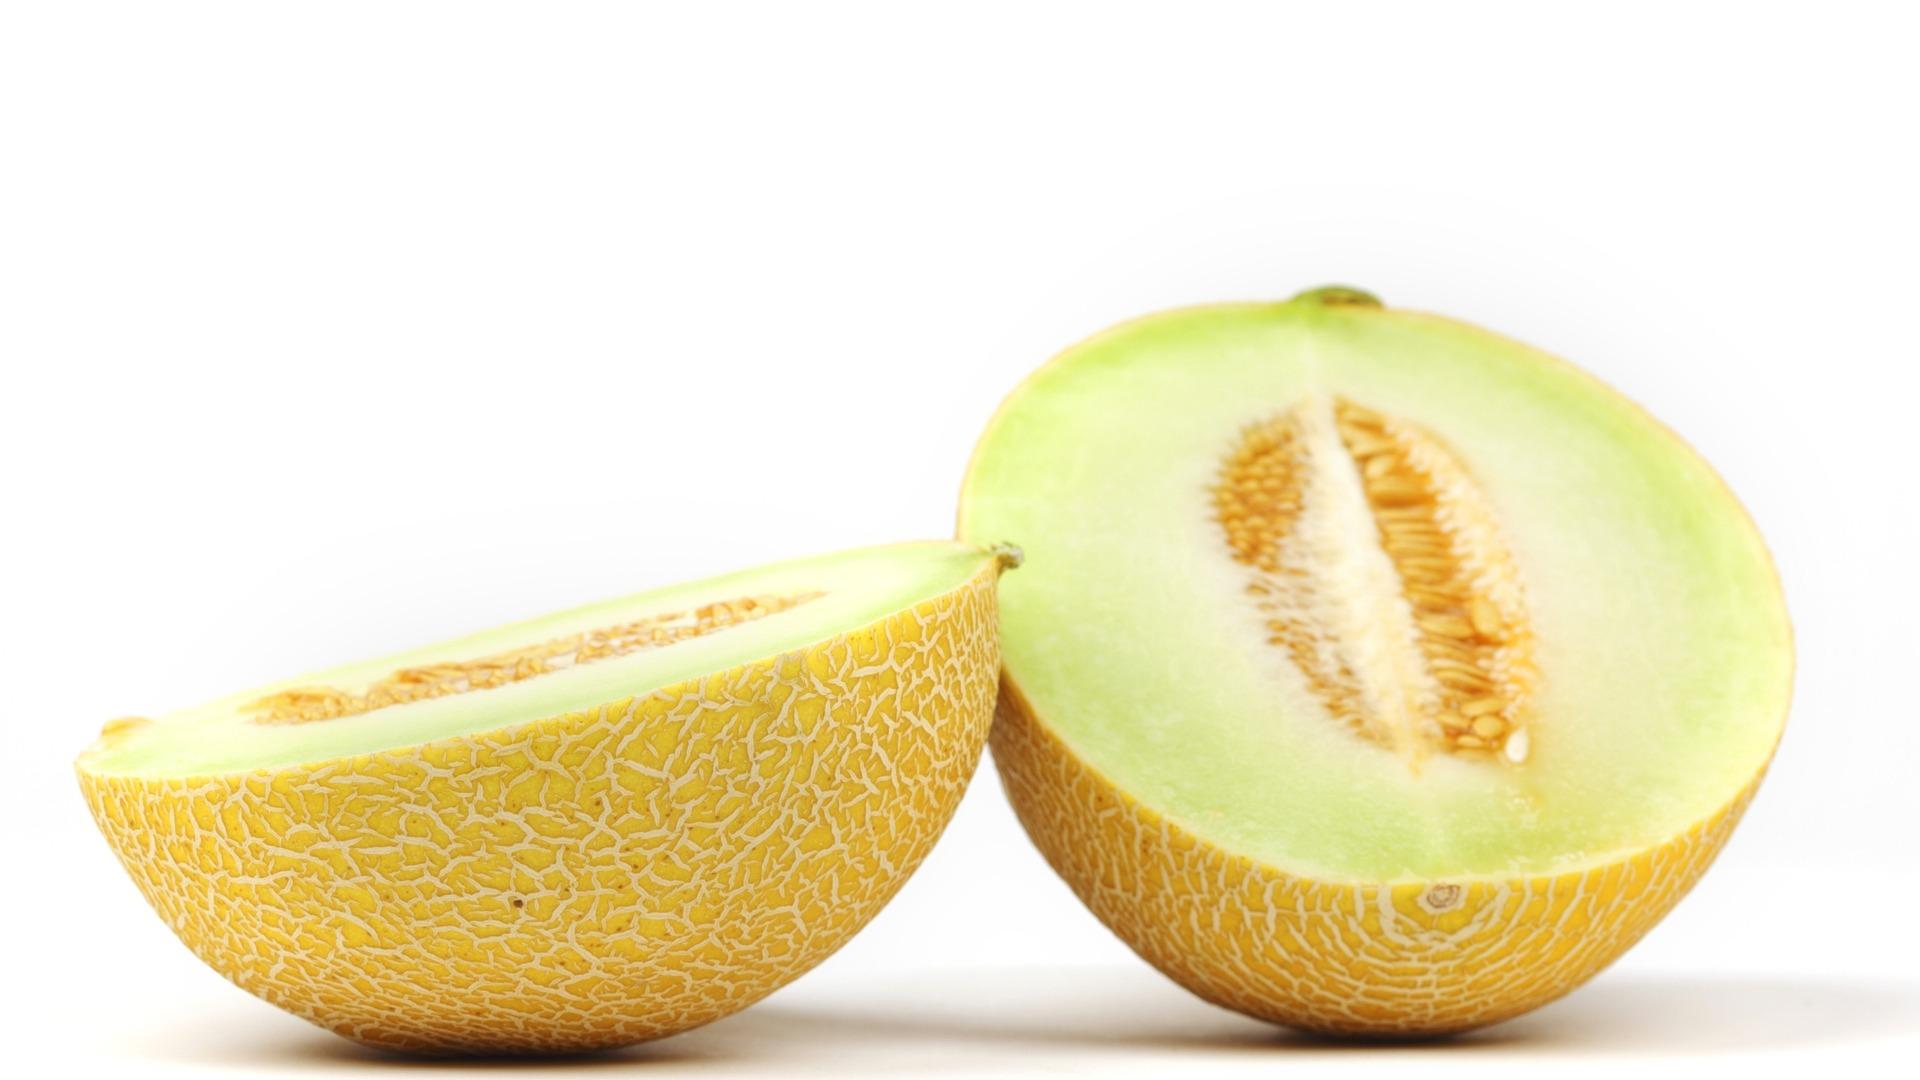 galia melon